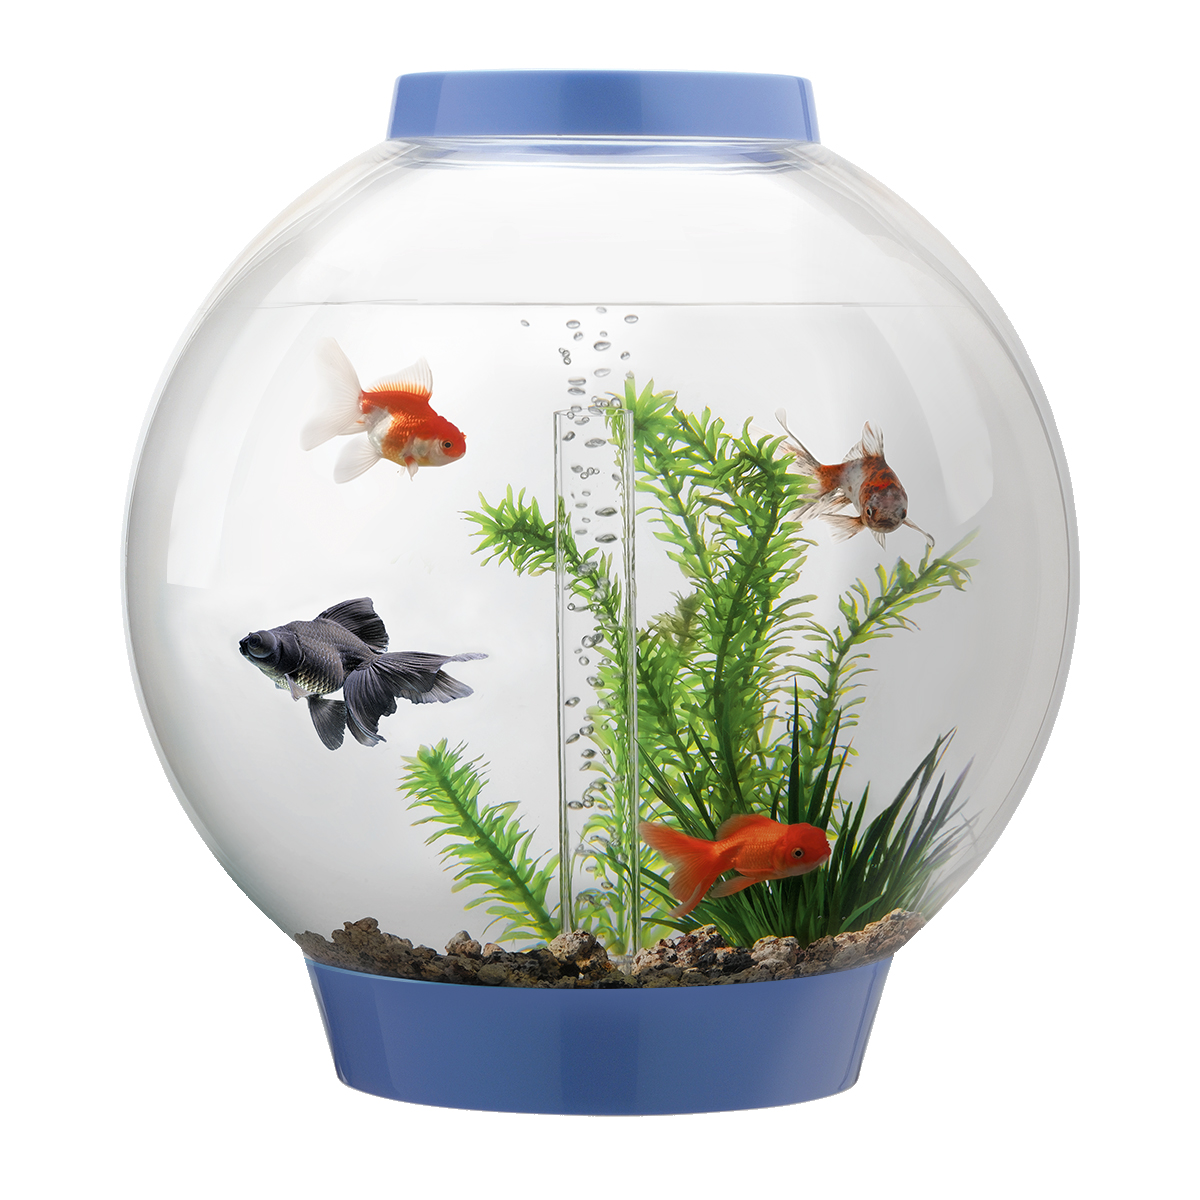 Biorb classic 30l denim blue aquarium with standard led for Fish bowl fish